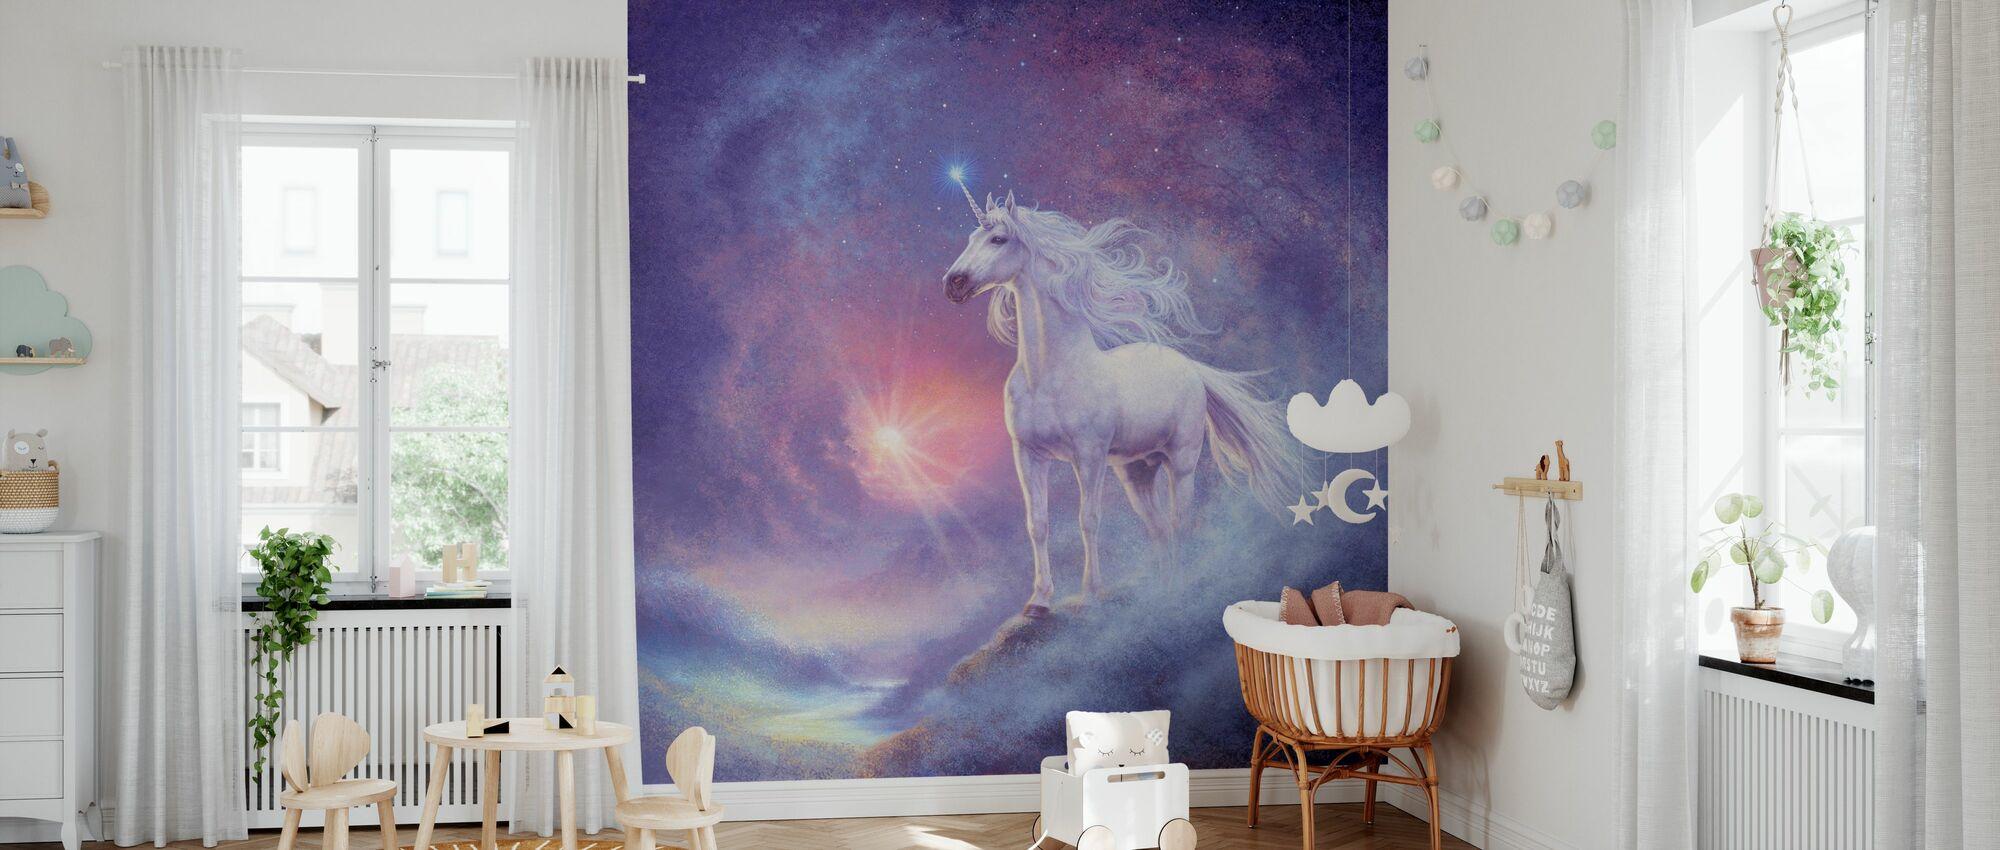 Astral Unicorn - Wallpaper - Nursery